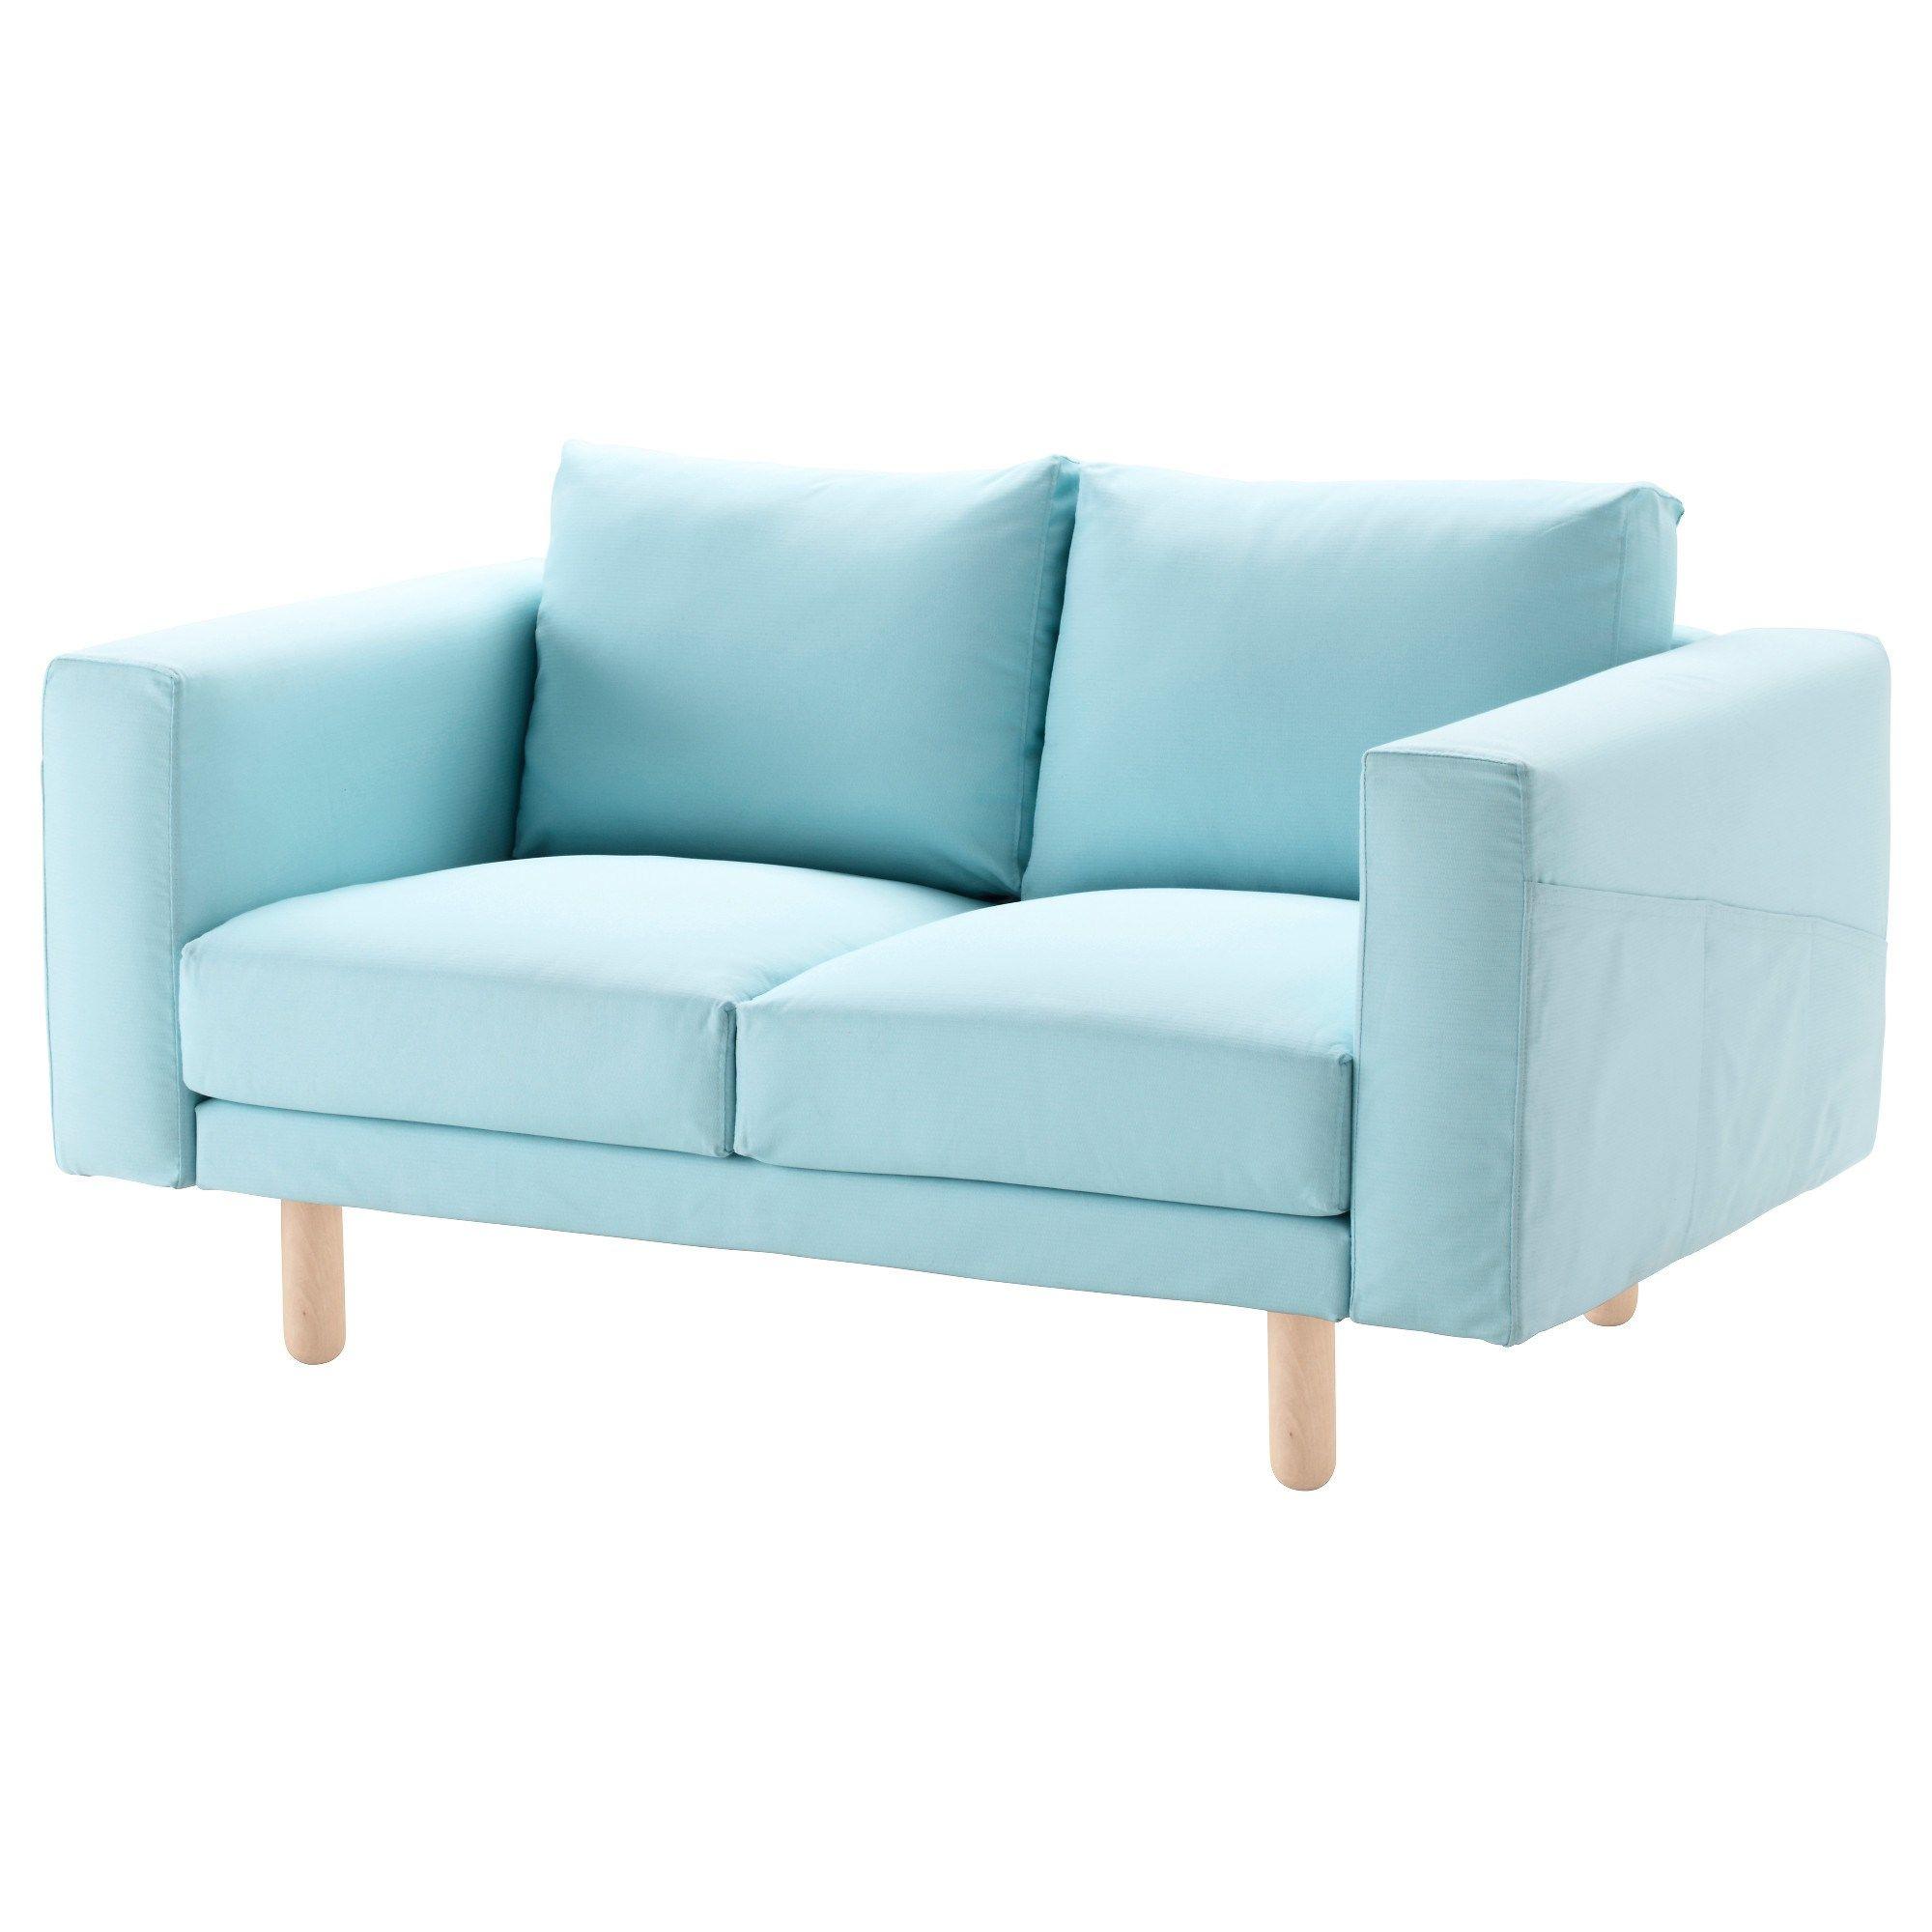 Delaks Yatakli Koltuk Takimi Wooden Sofa Designs Armchair Furniture Curved Sofa Living Room